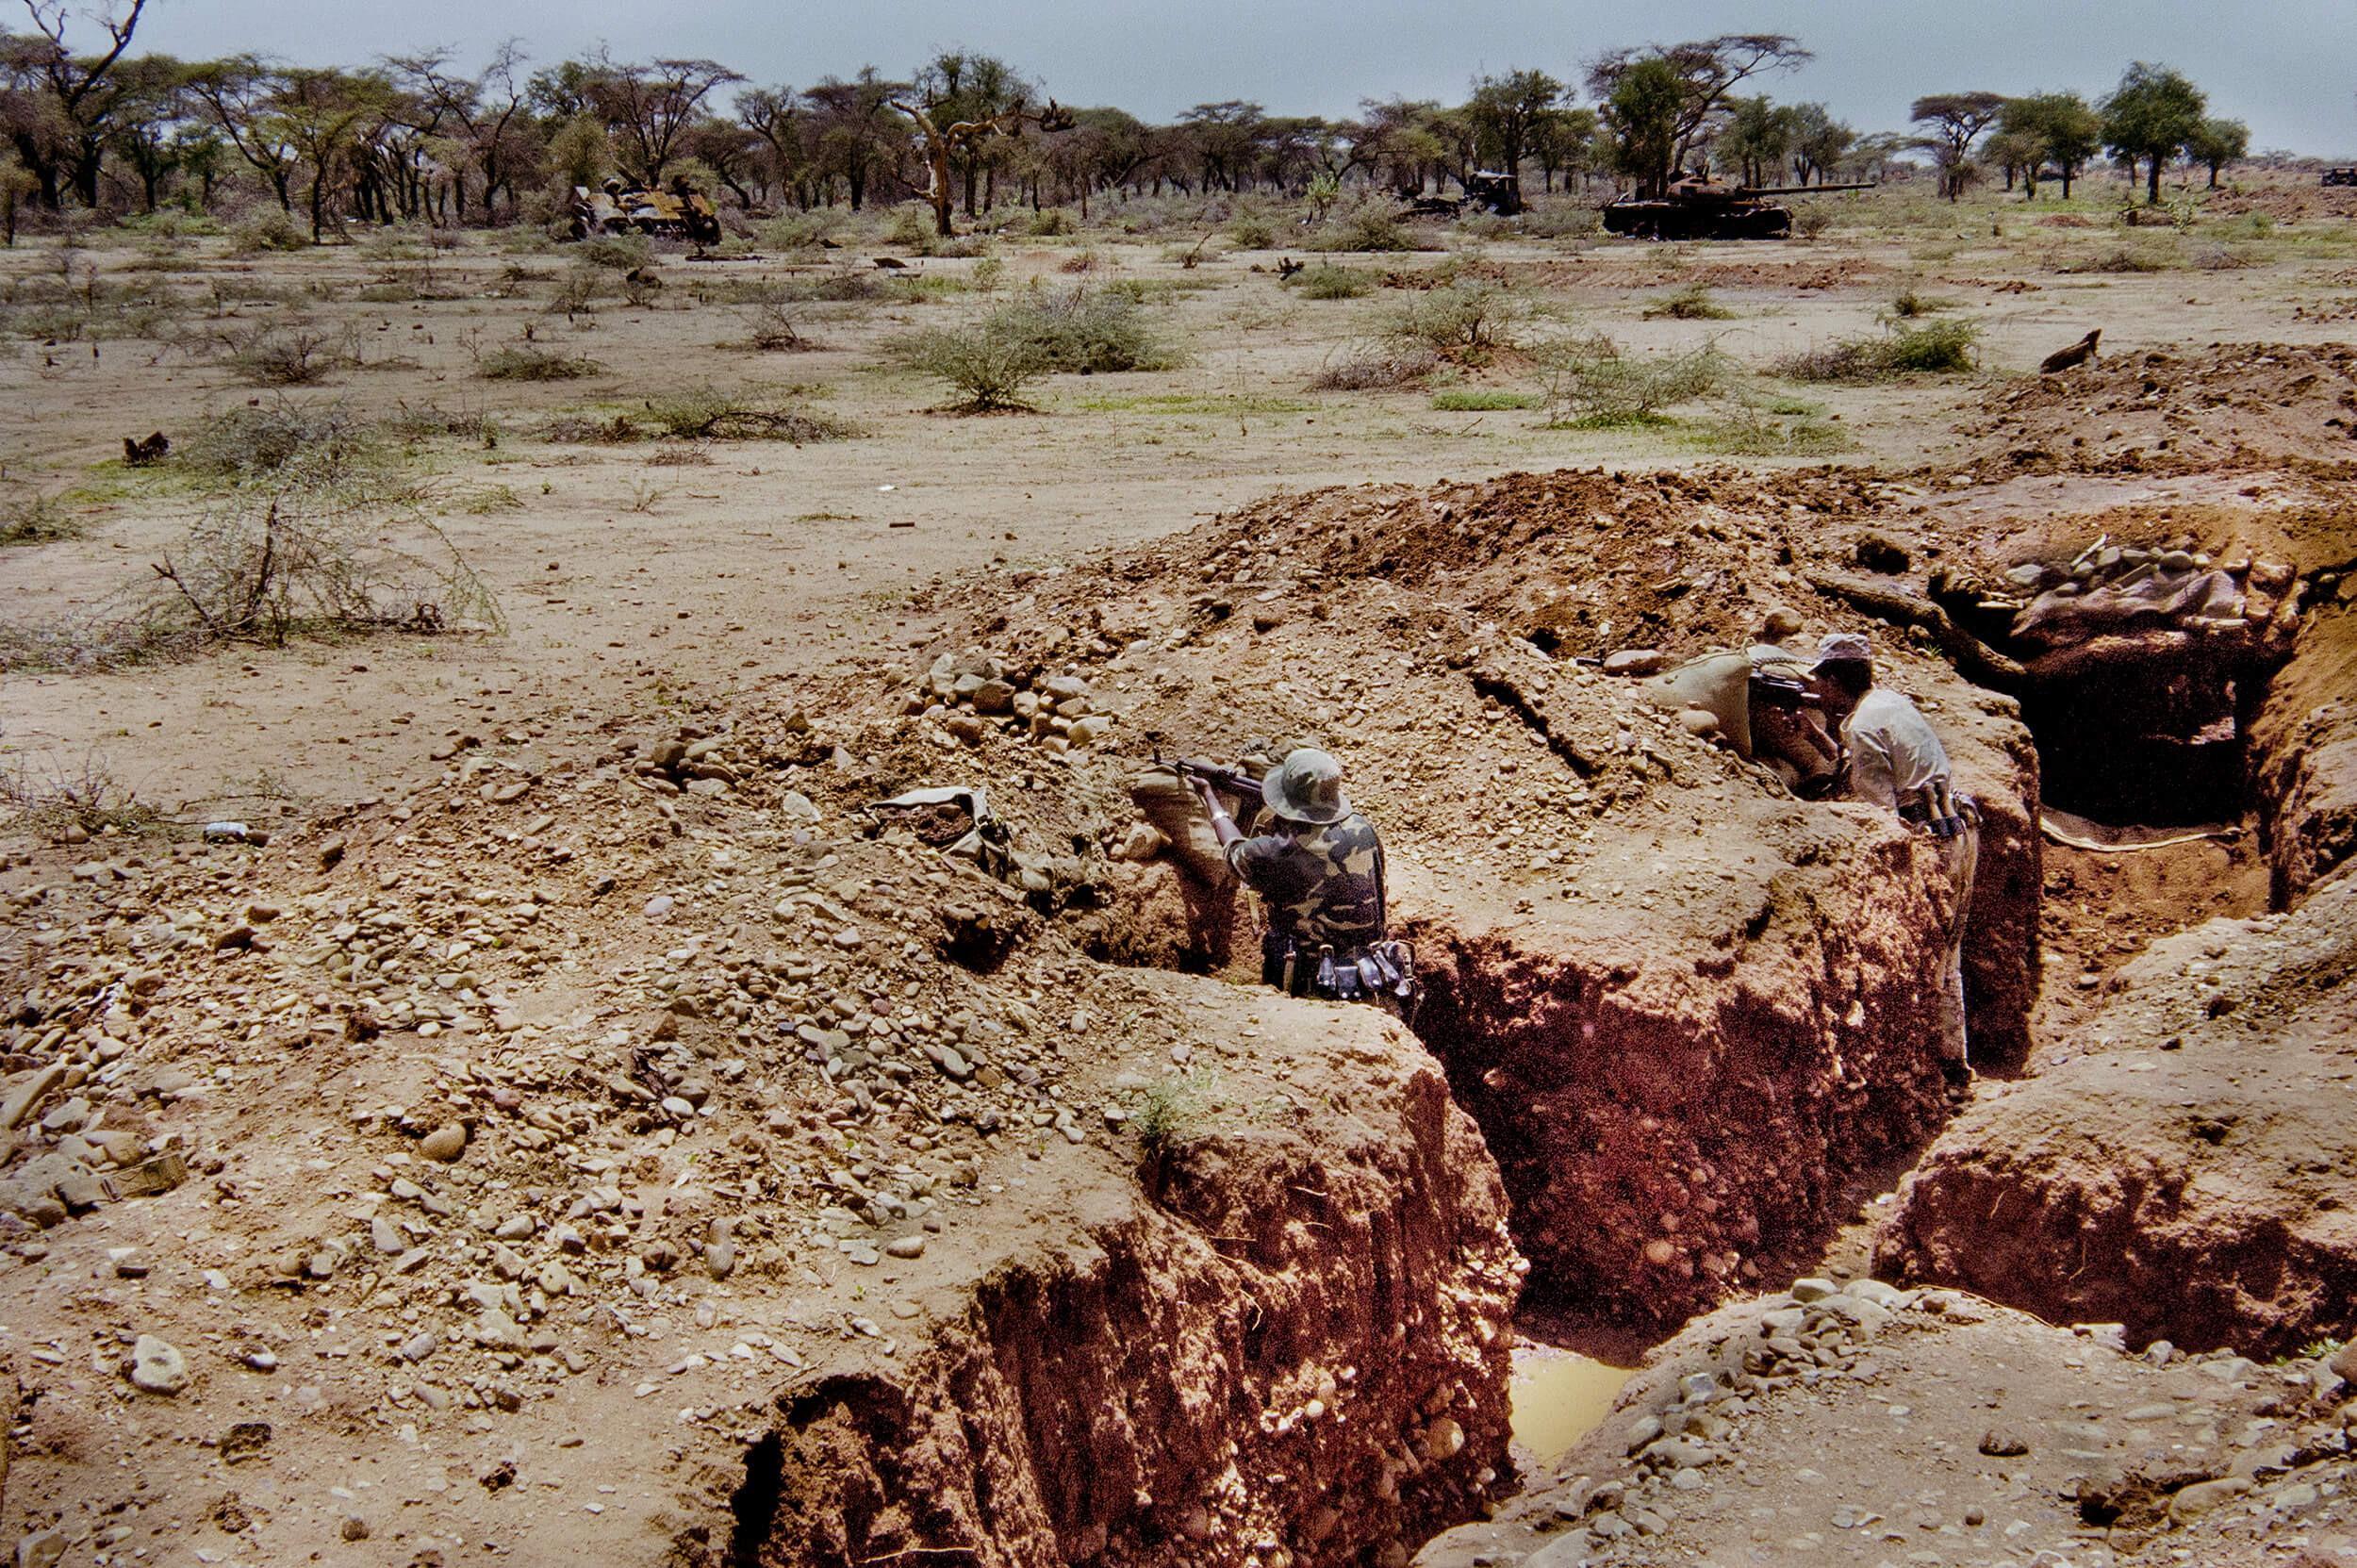 Kriget 1998. Eritreanska soldater vid Tzoronafronten.jpg